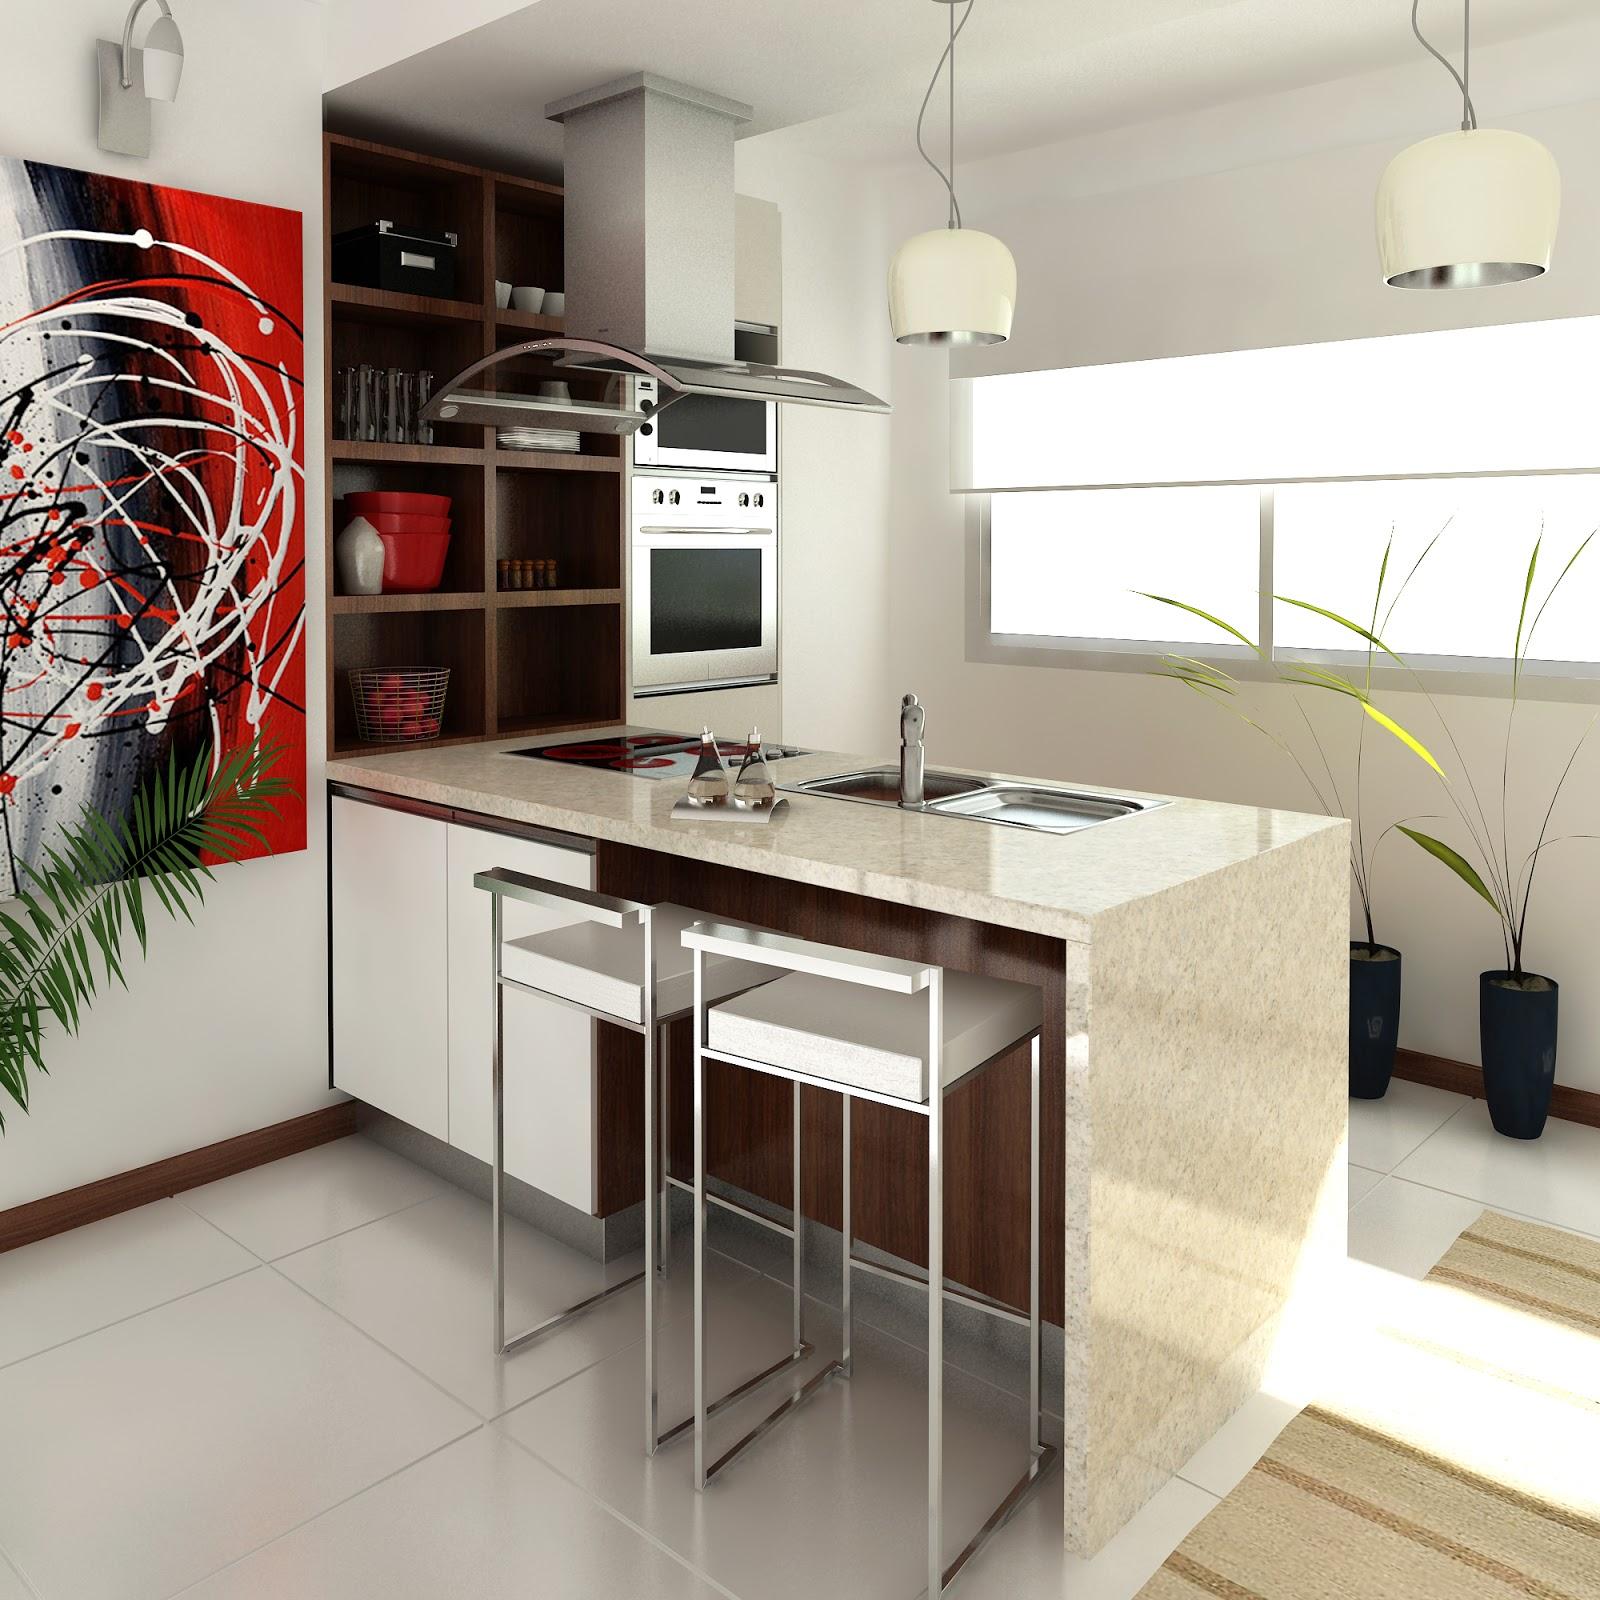 Arquitectura en im genes 3d dise o de interiores cocinas for Ver disenos de cocinas pequenas